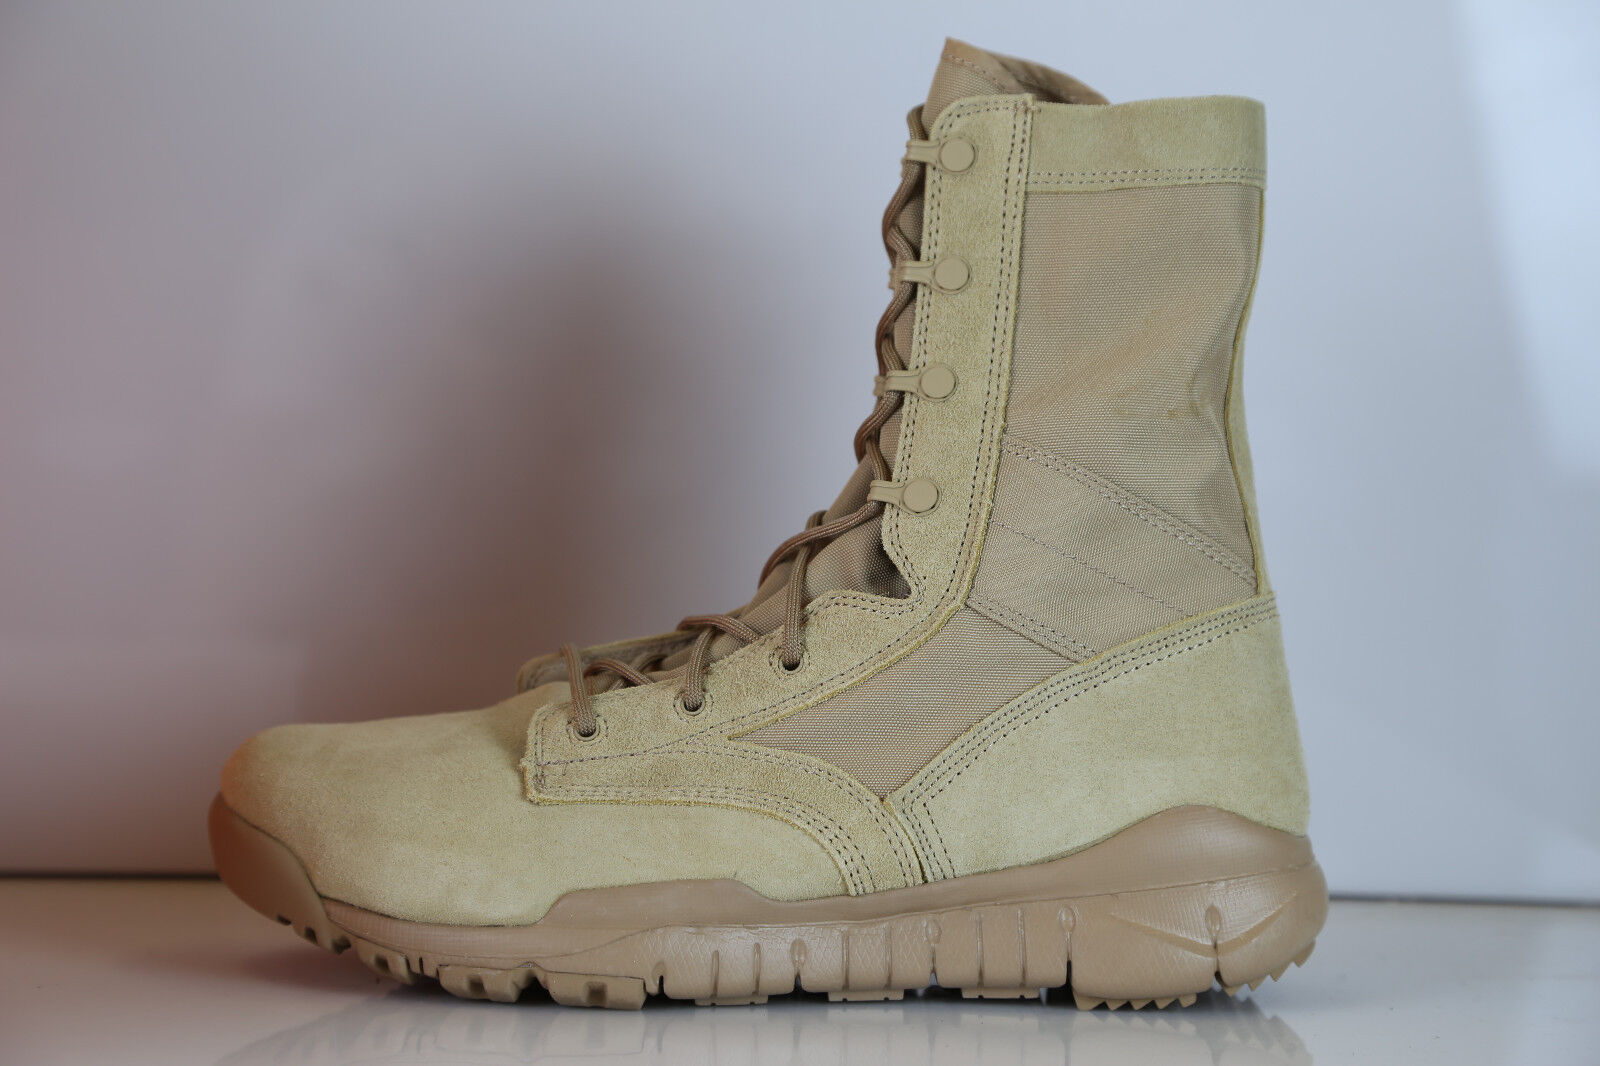 Nike Arranque Sfb Cuero British Khaki tan especial Field Arranque Nike 6889732018 6.515 Sp Libre 236748